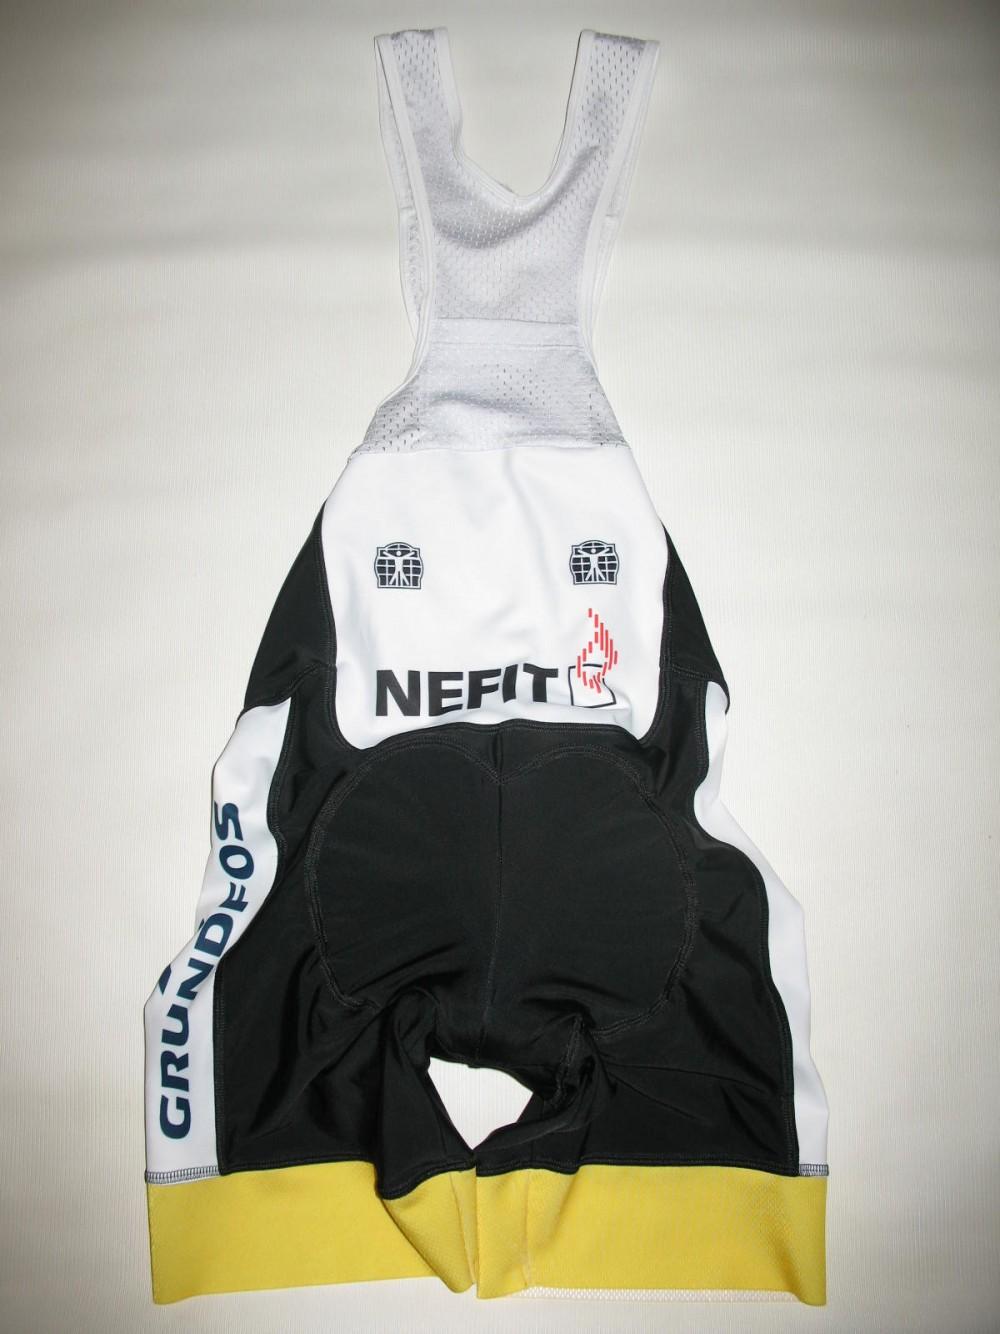 Велошорты BIORACER grundfos wasco bib cycling shorts (размер 4-XL/L) - 2